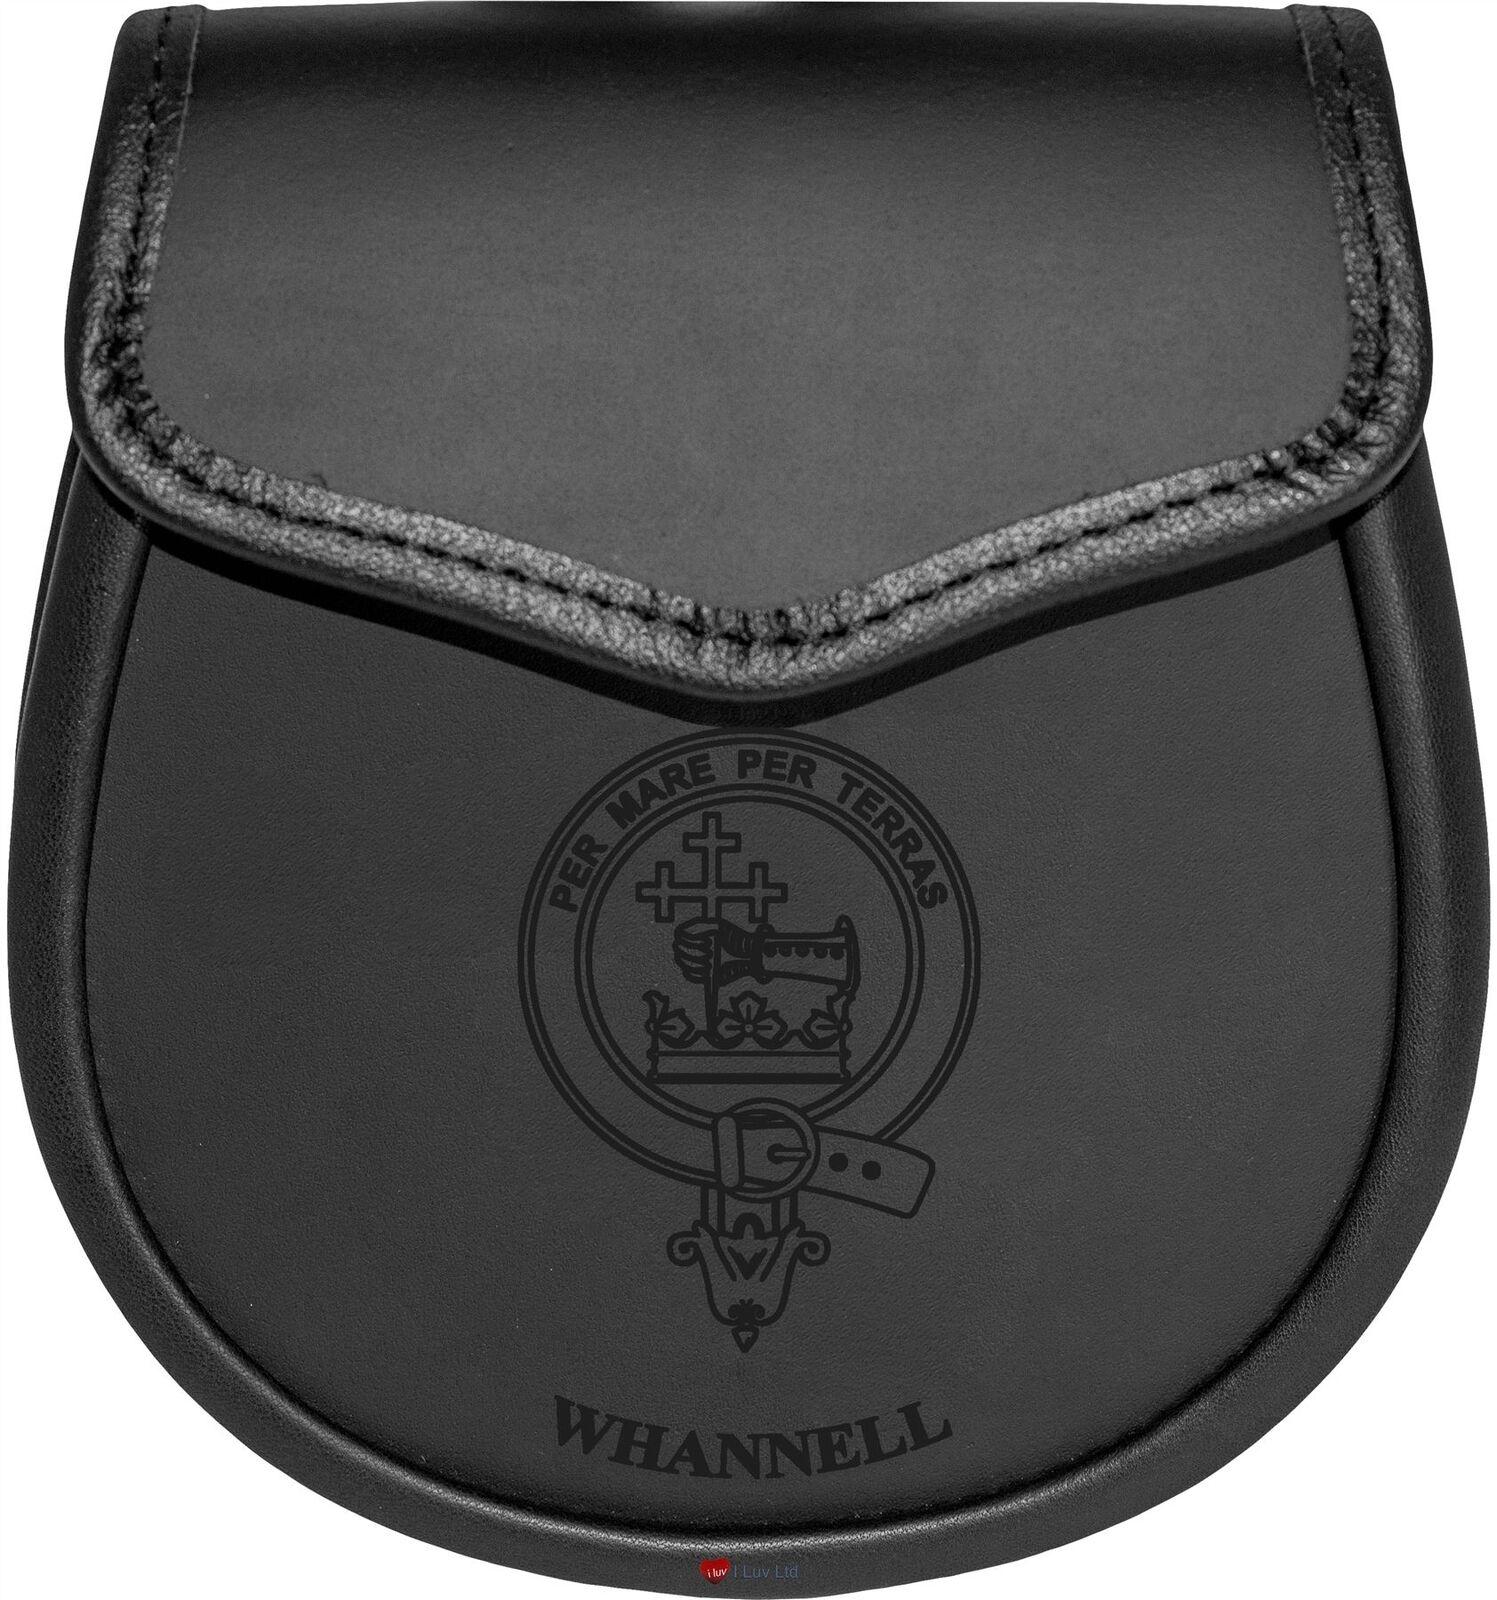 Whannell Leather Day Sporran Scottish Clan Crest